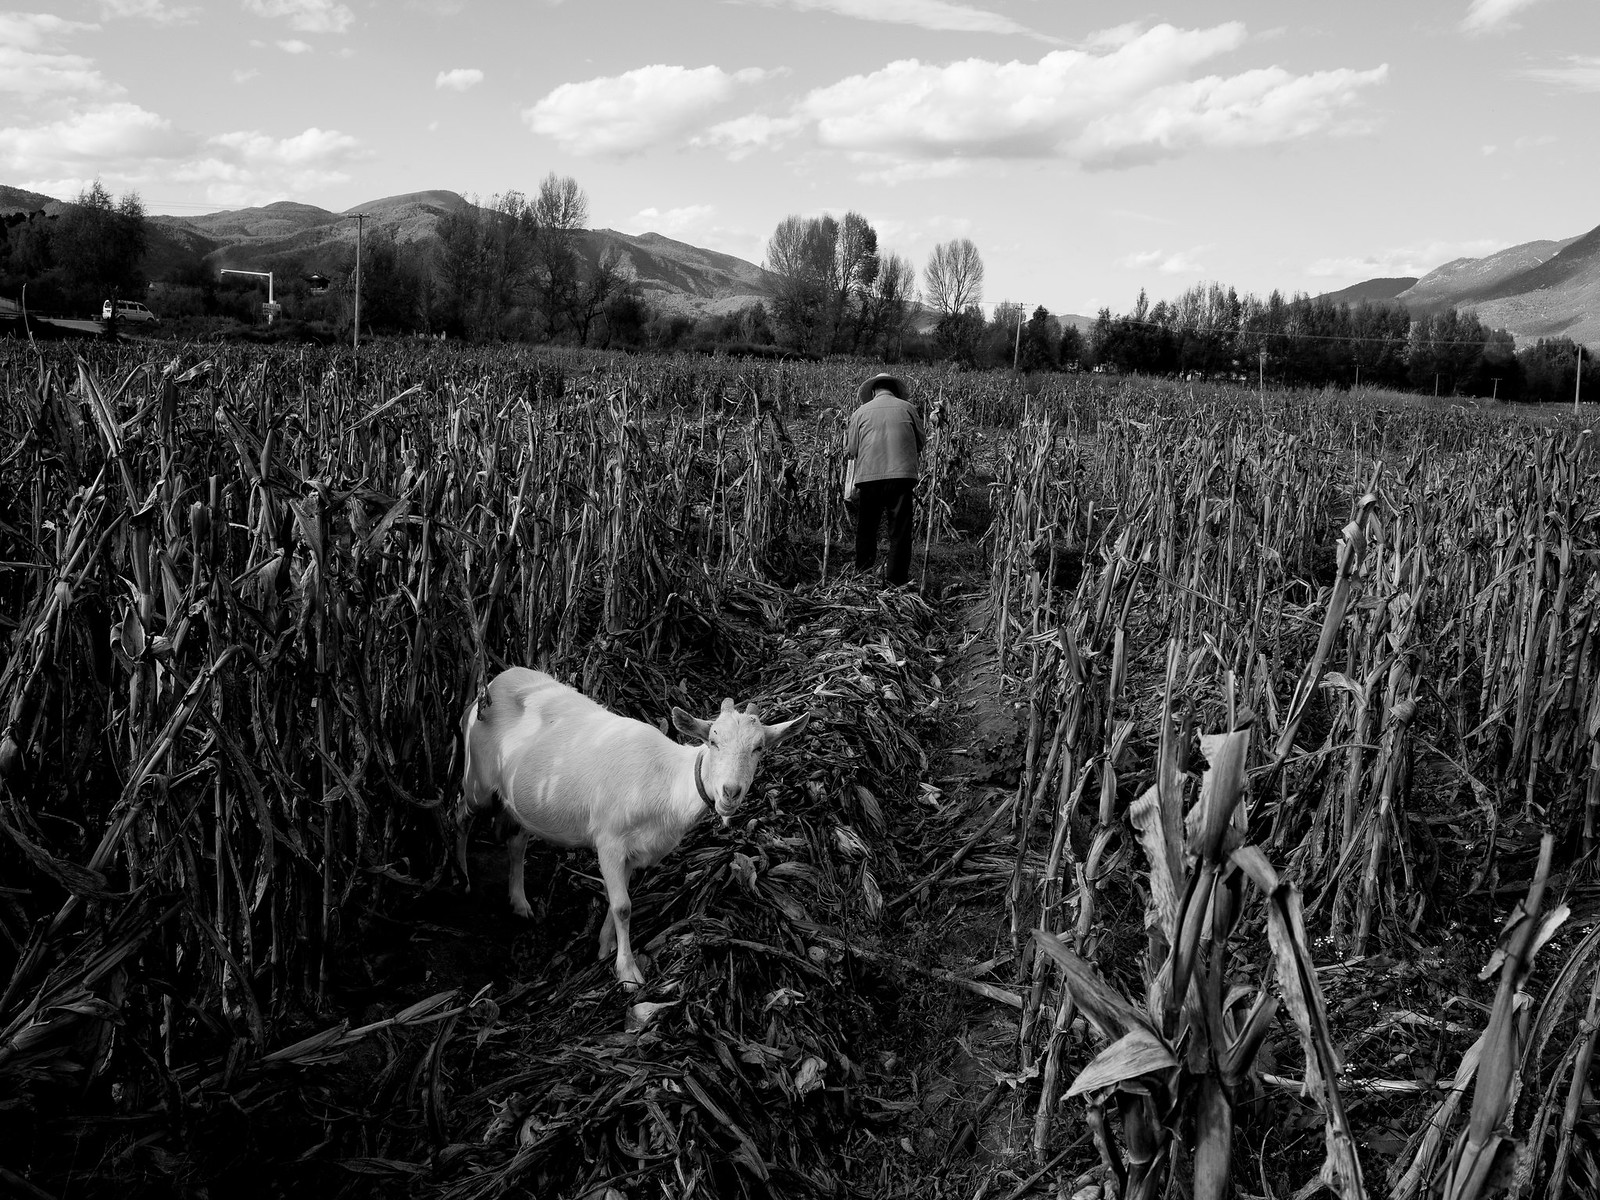 man and goat | by tzen xing